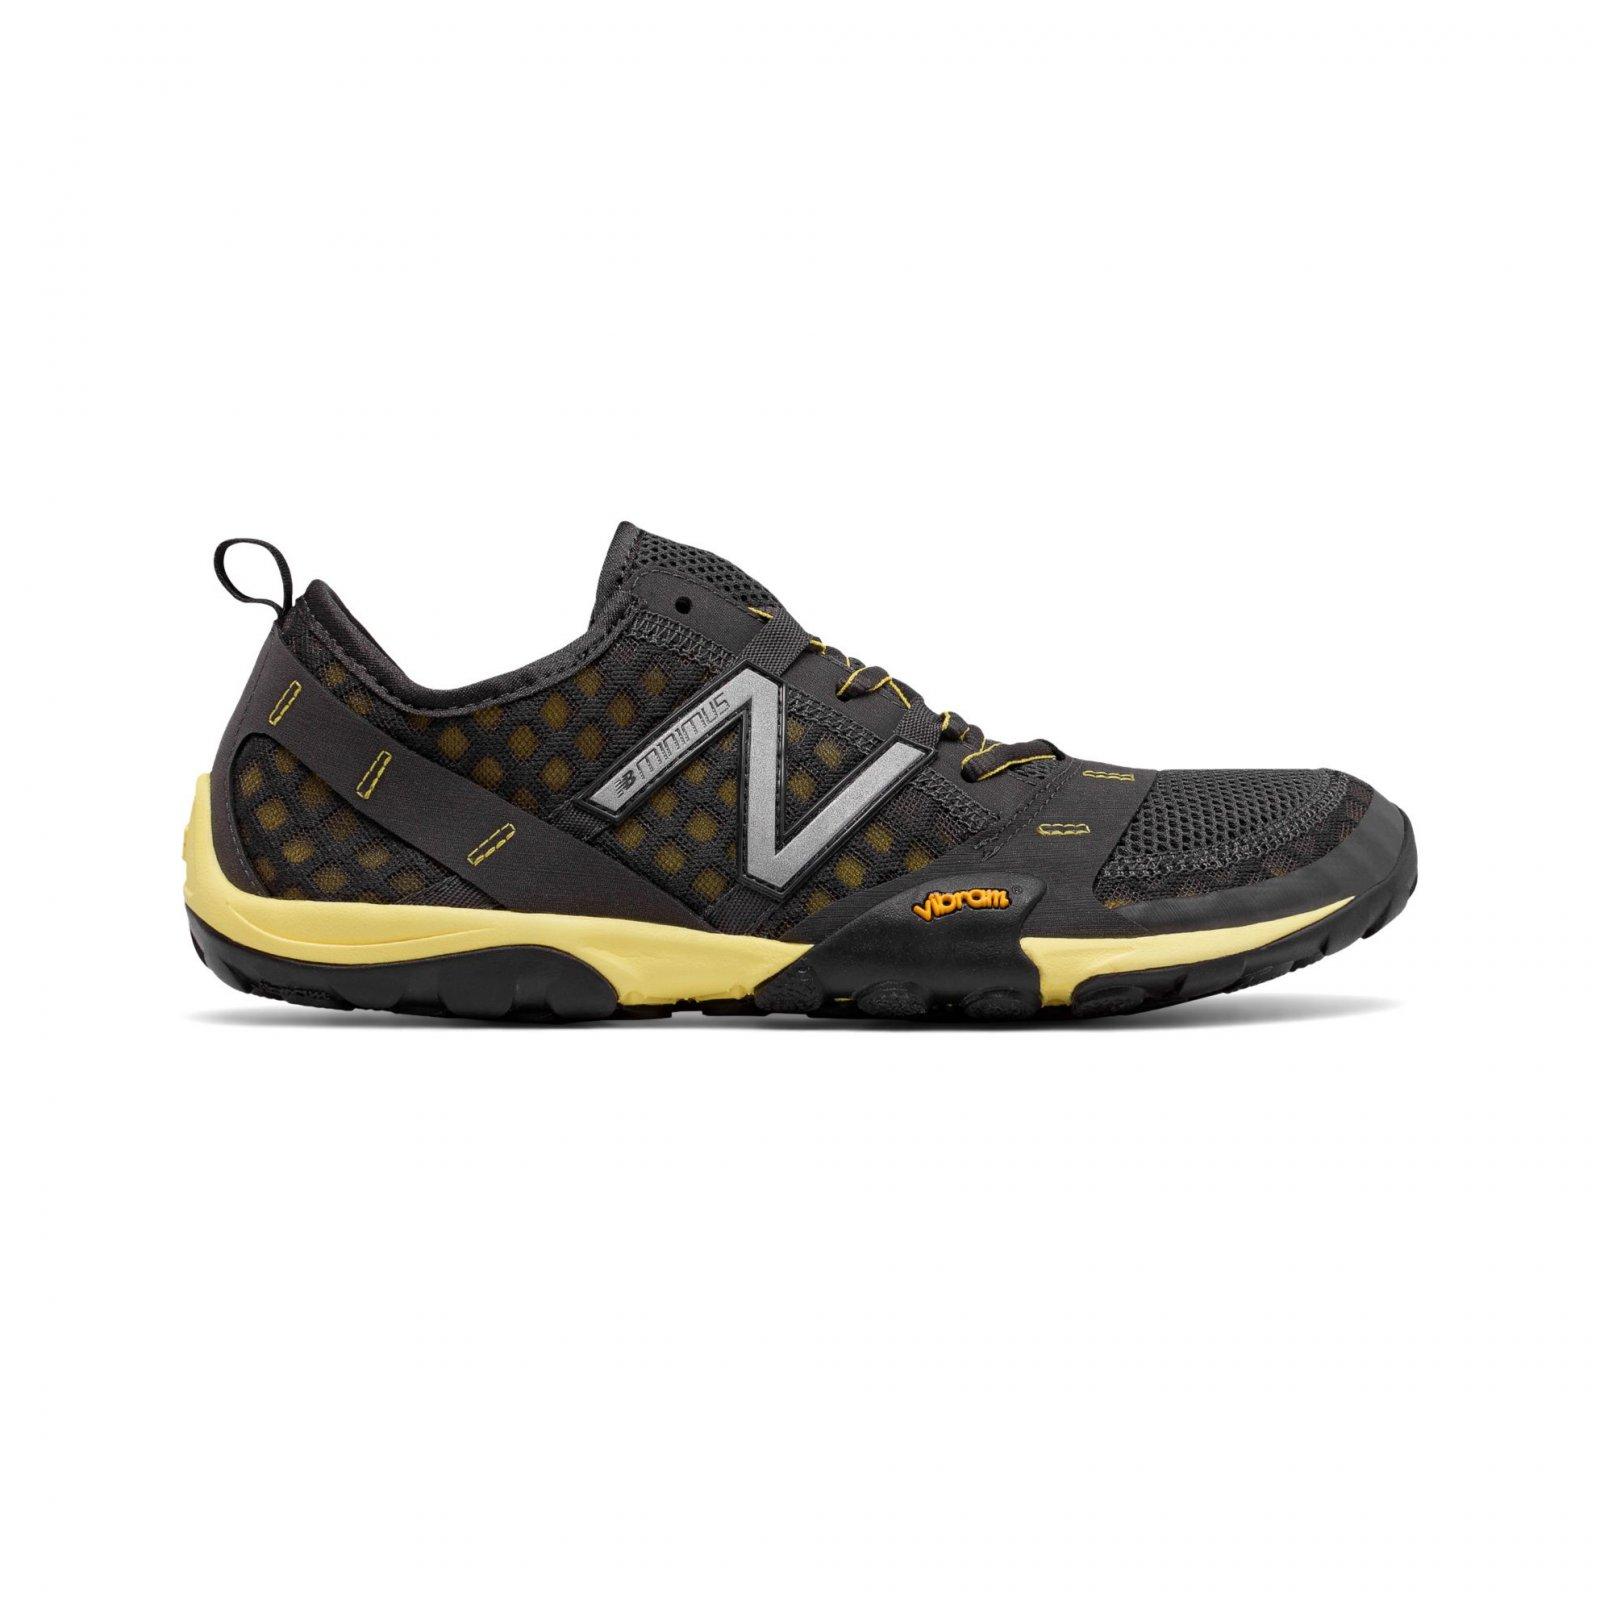 8a5a392e12e Minimalistické trailové běžecké boty New Balance MT10GG Minimus ...